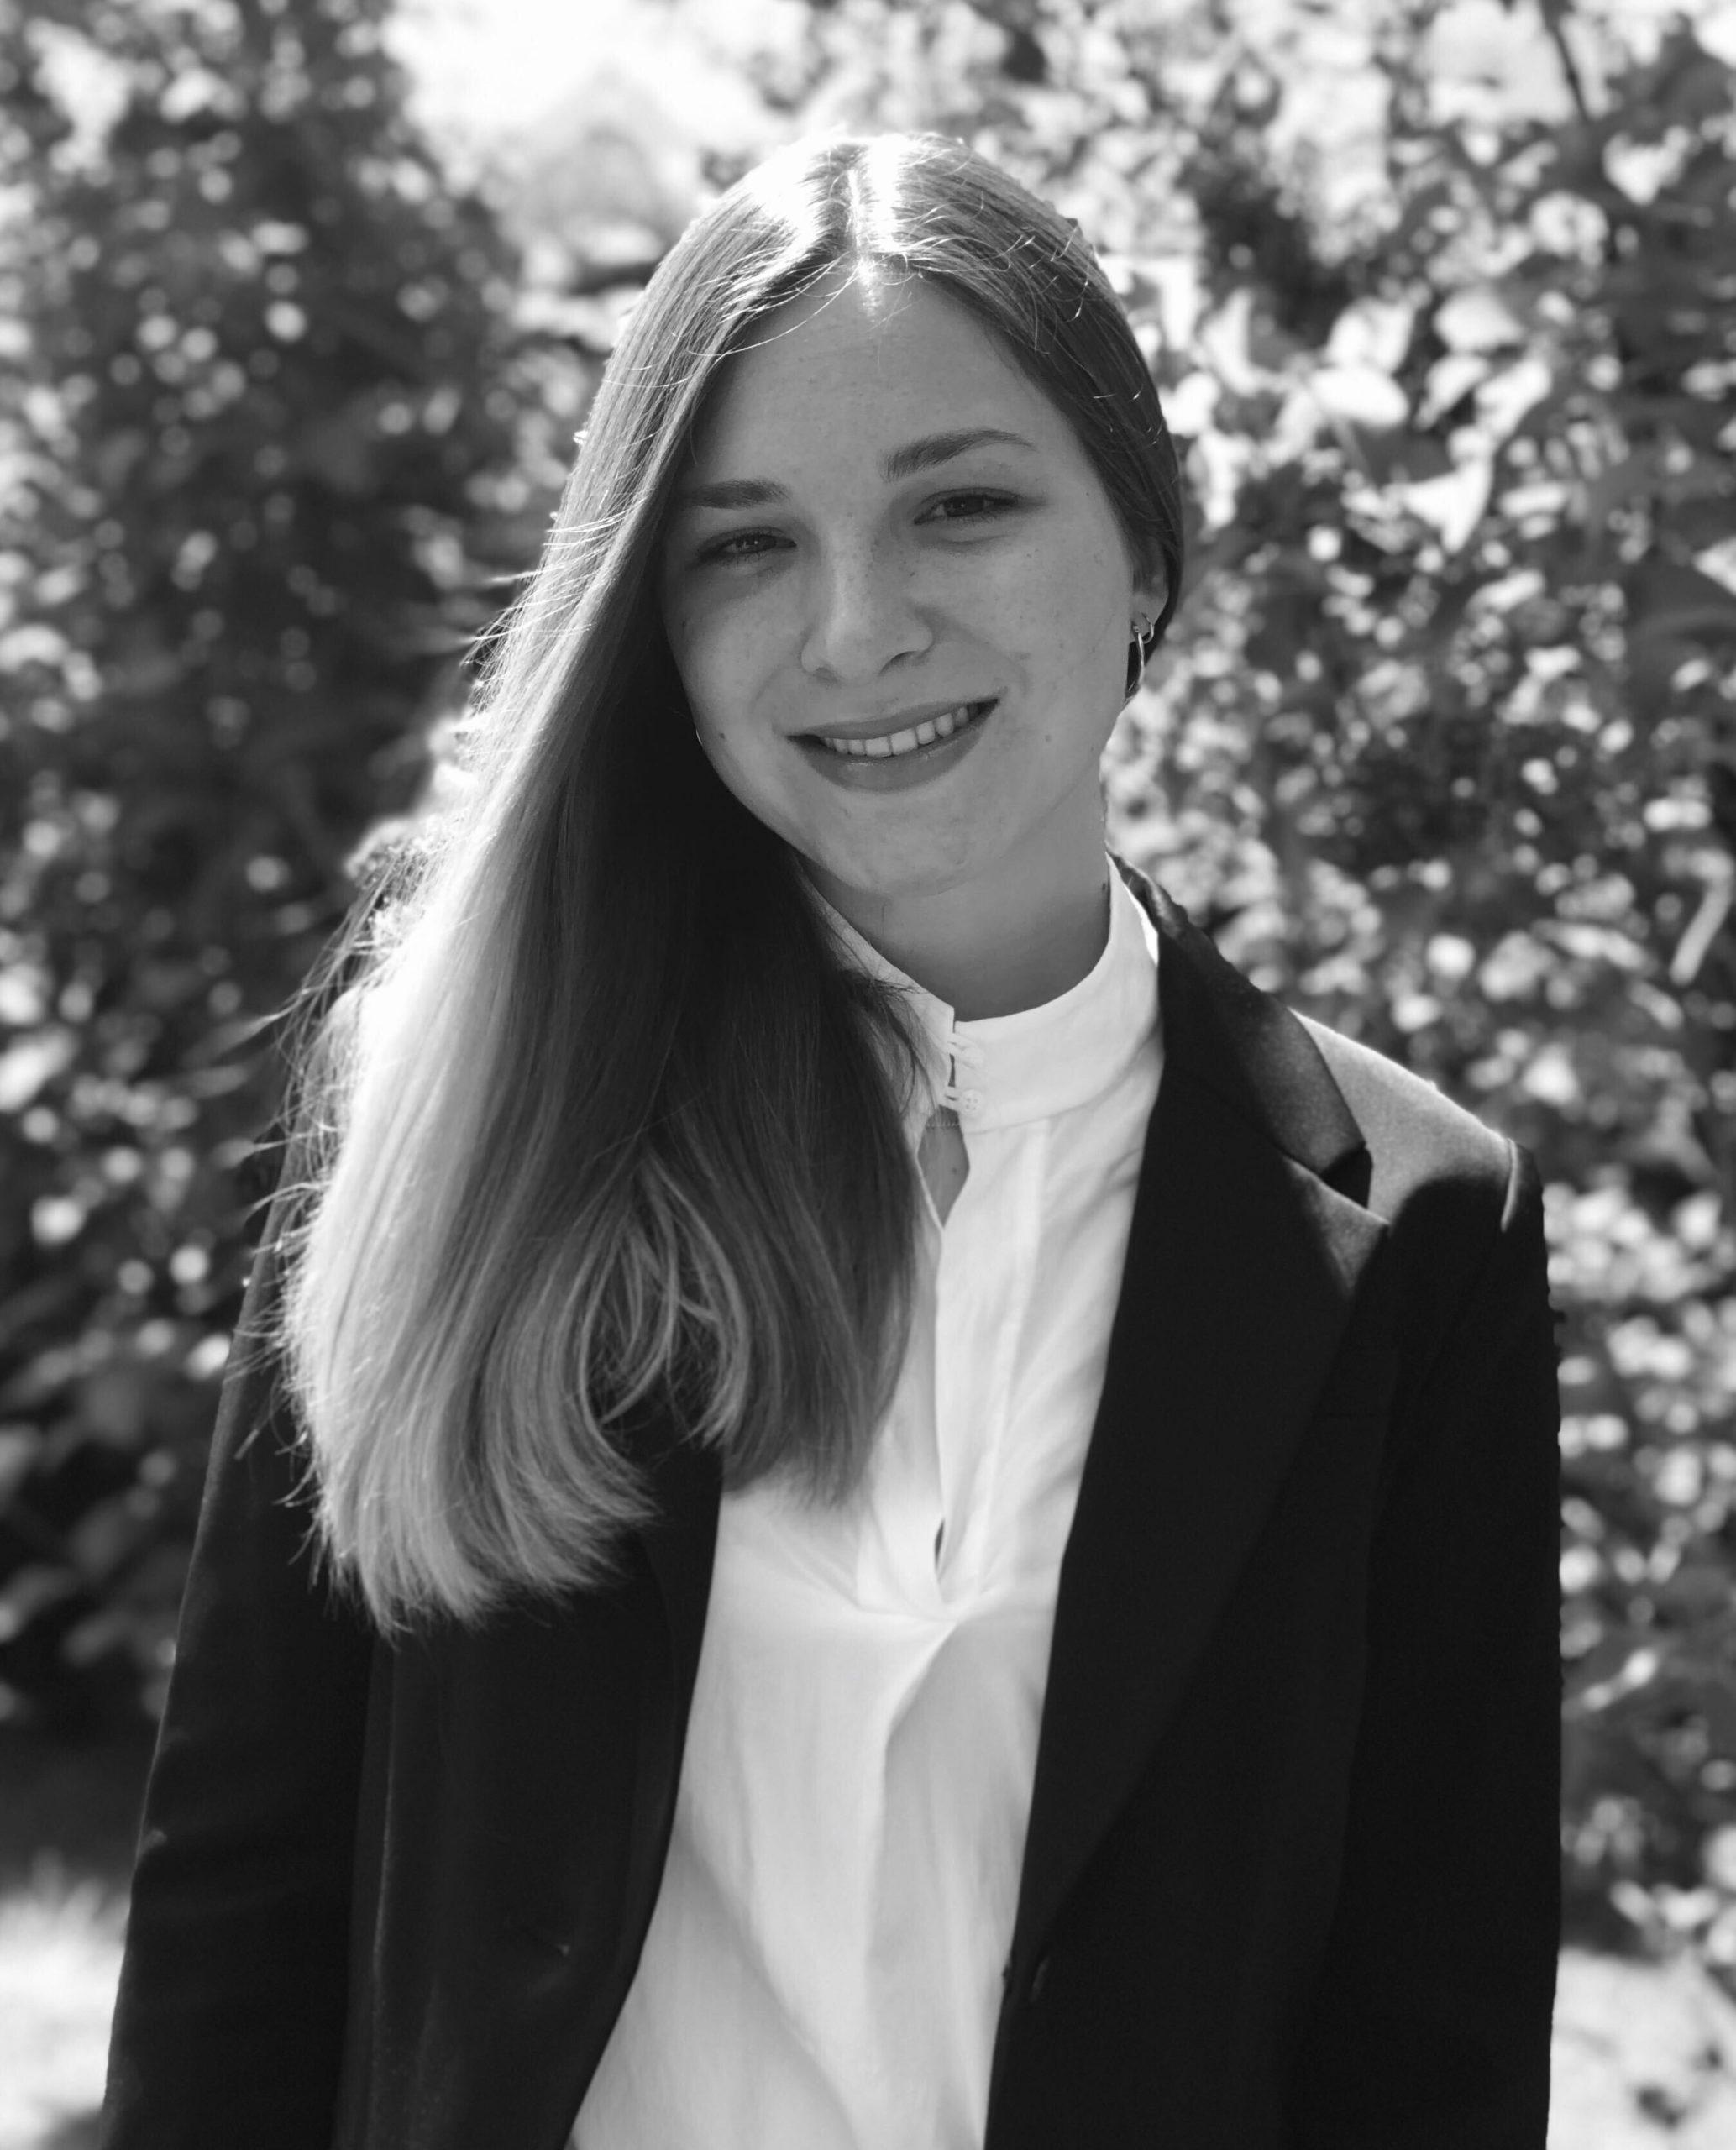 Isabela Keuschnigg